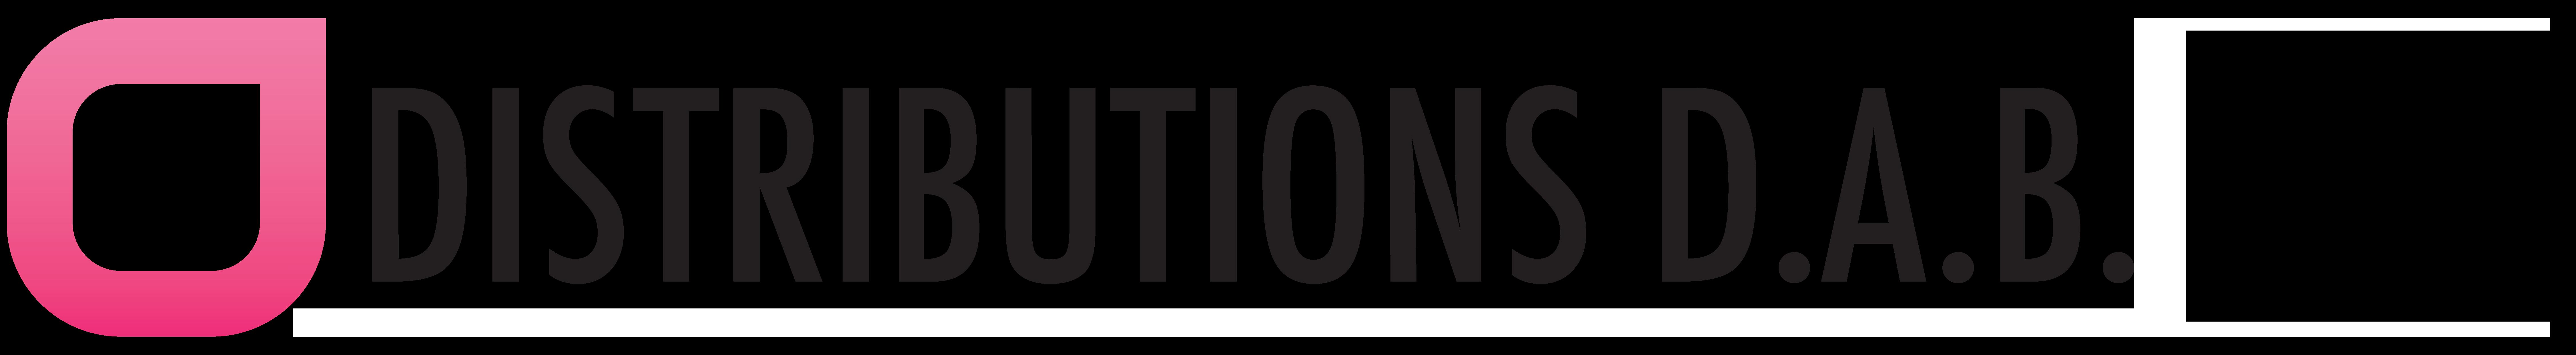 Distributions D.A.B. Inc.